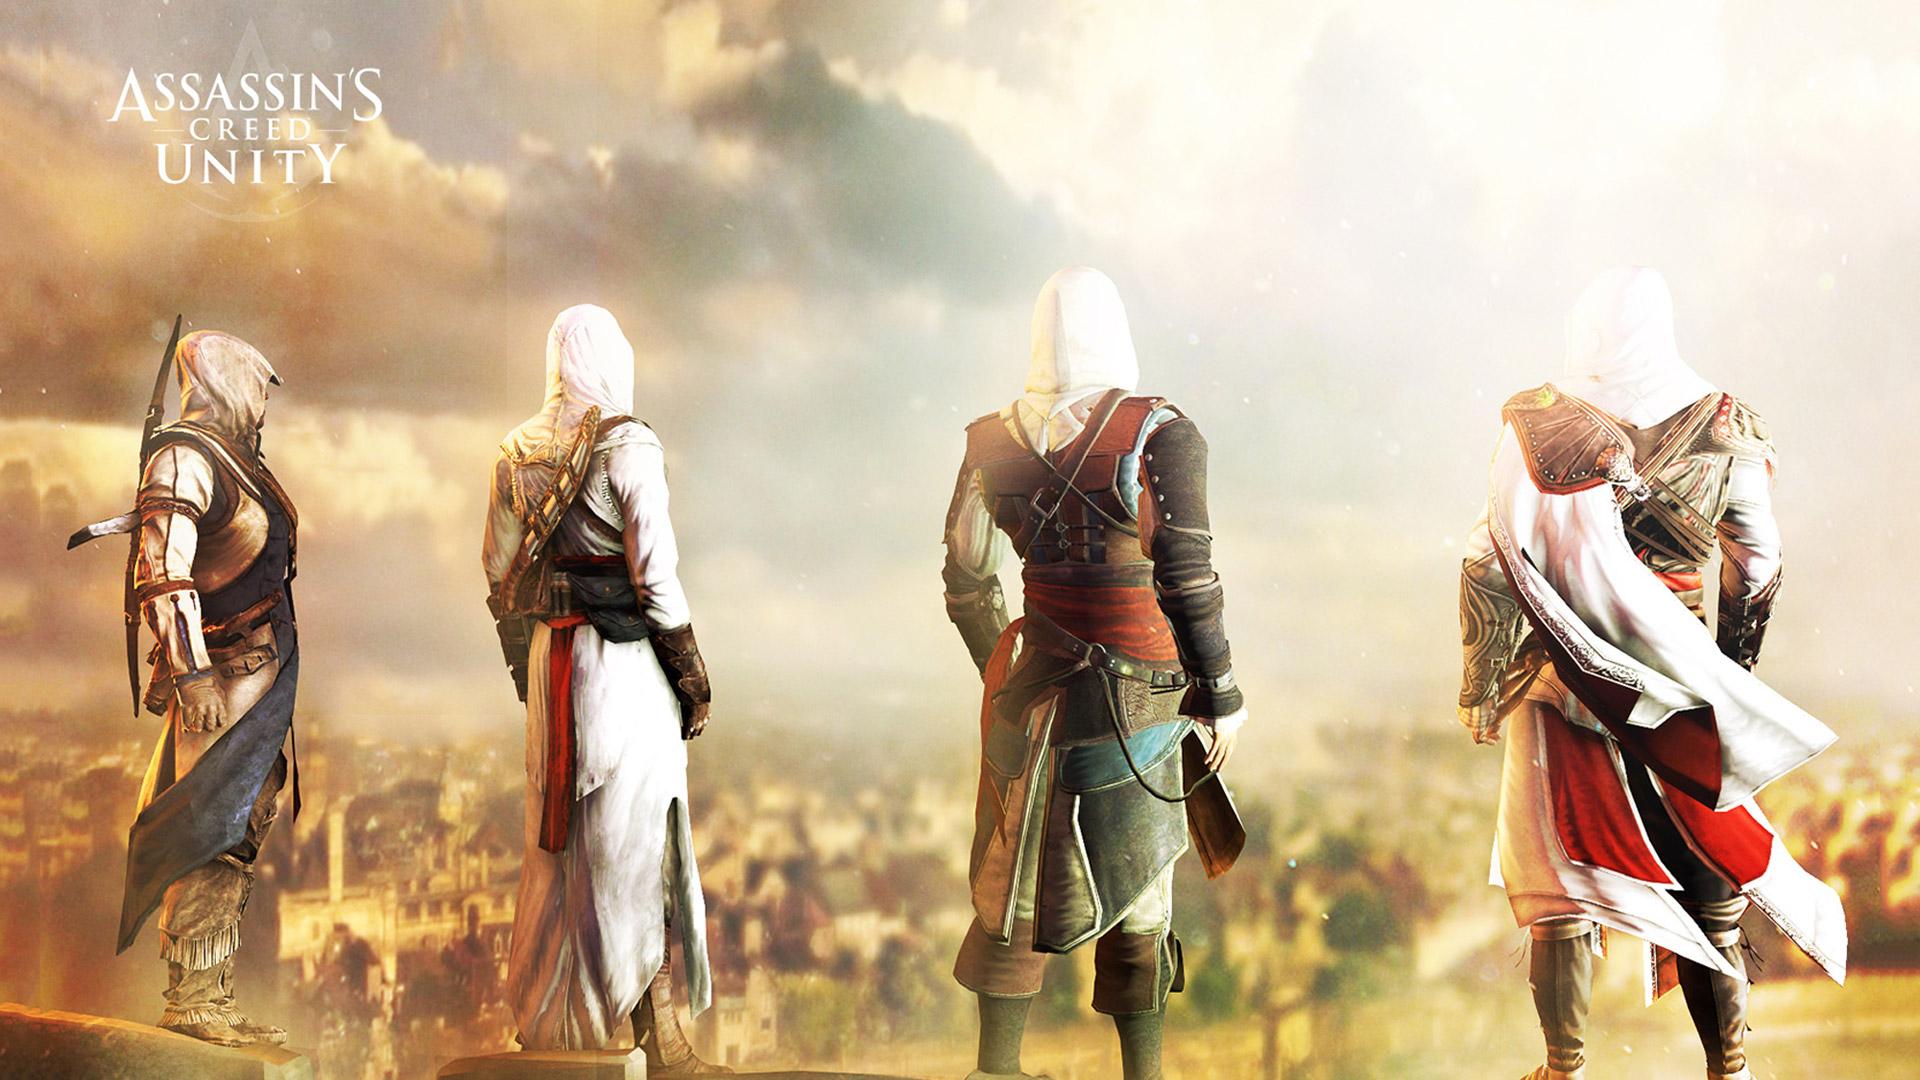 Assassins Creed Unity Wallpaper in 1920x1080 1920x1080